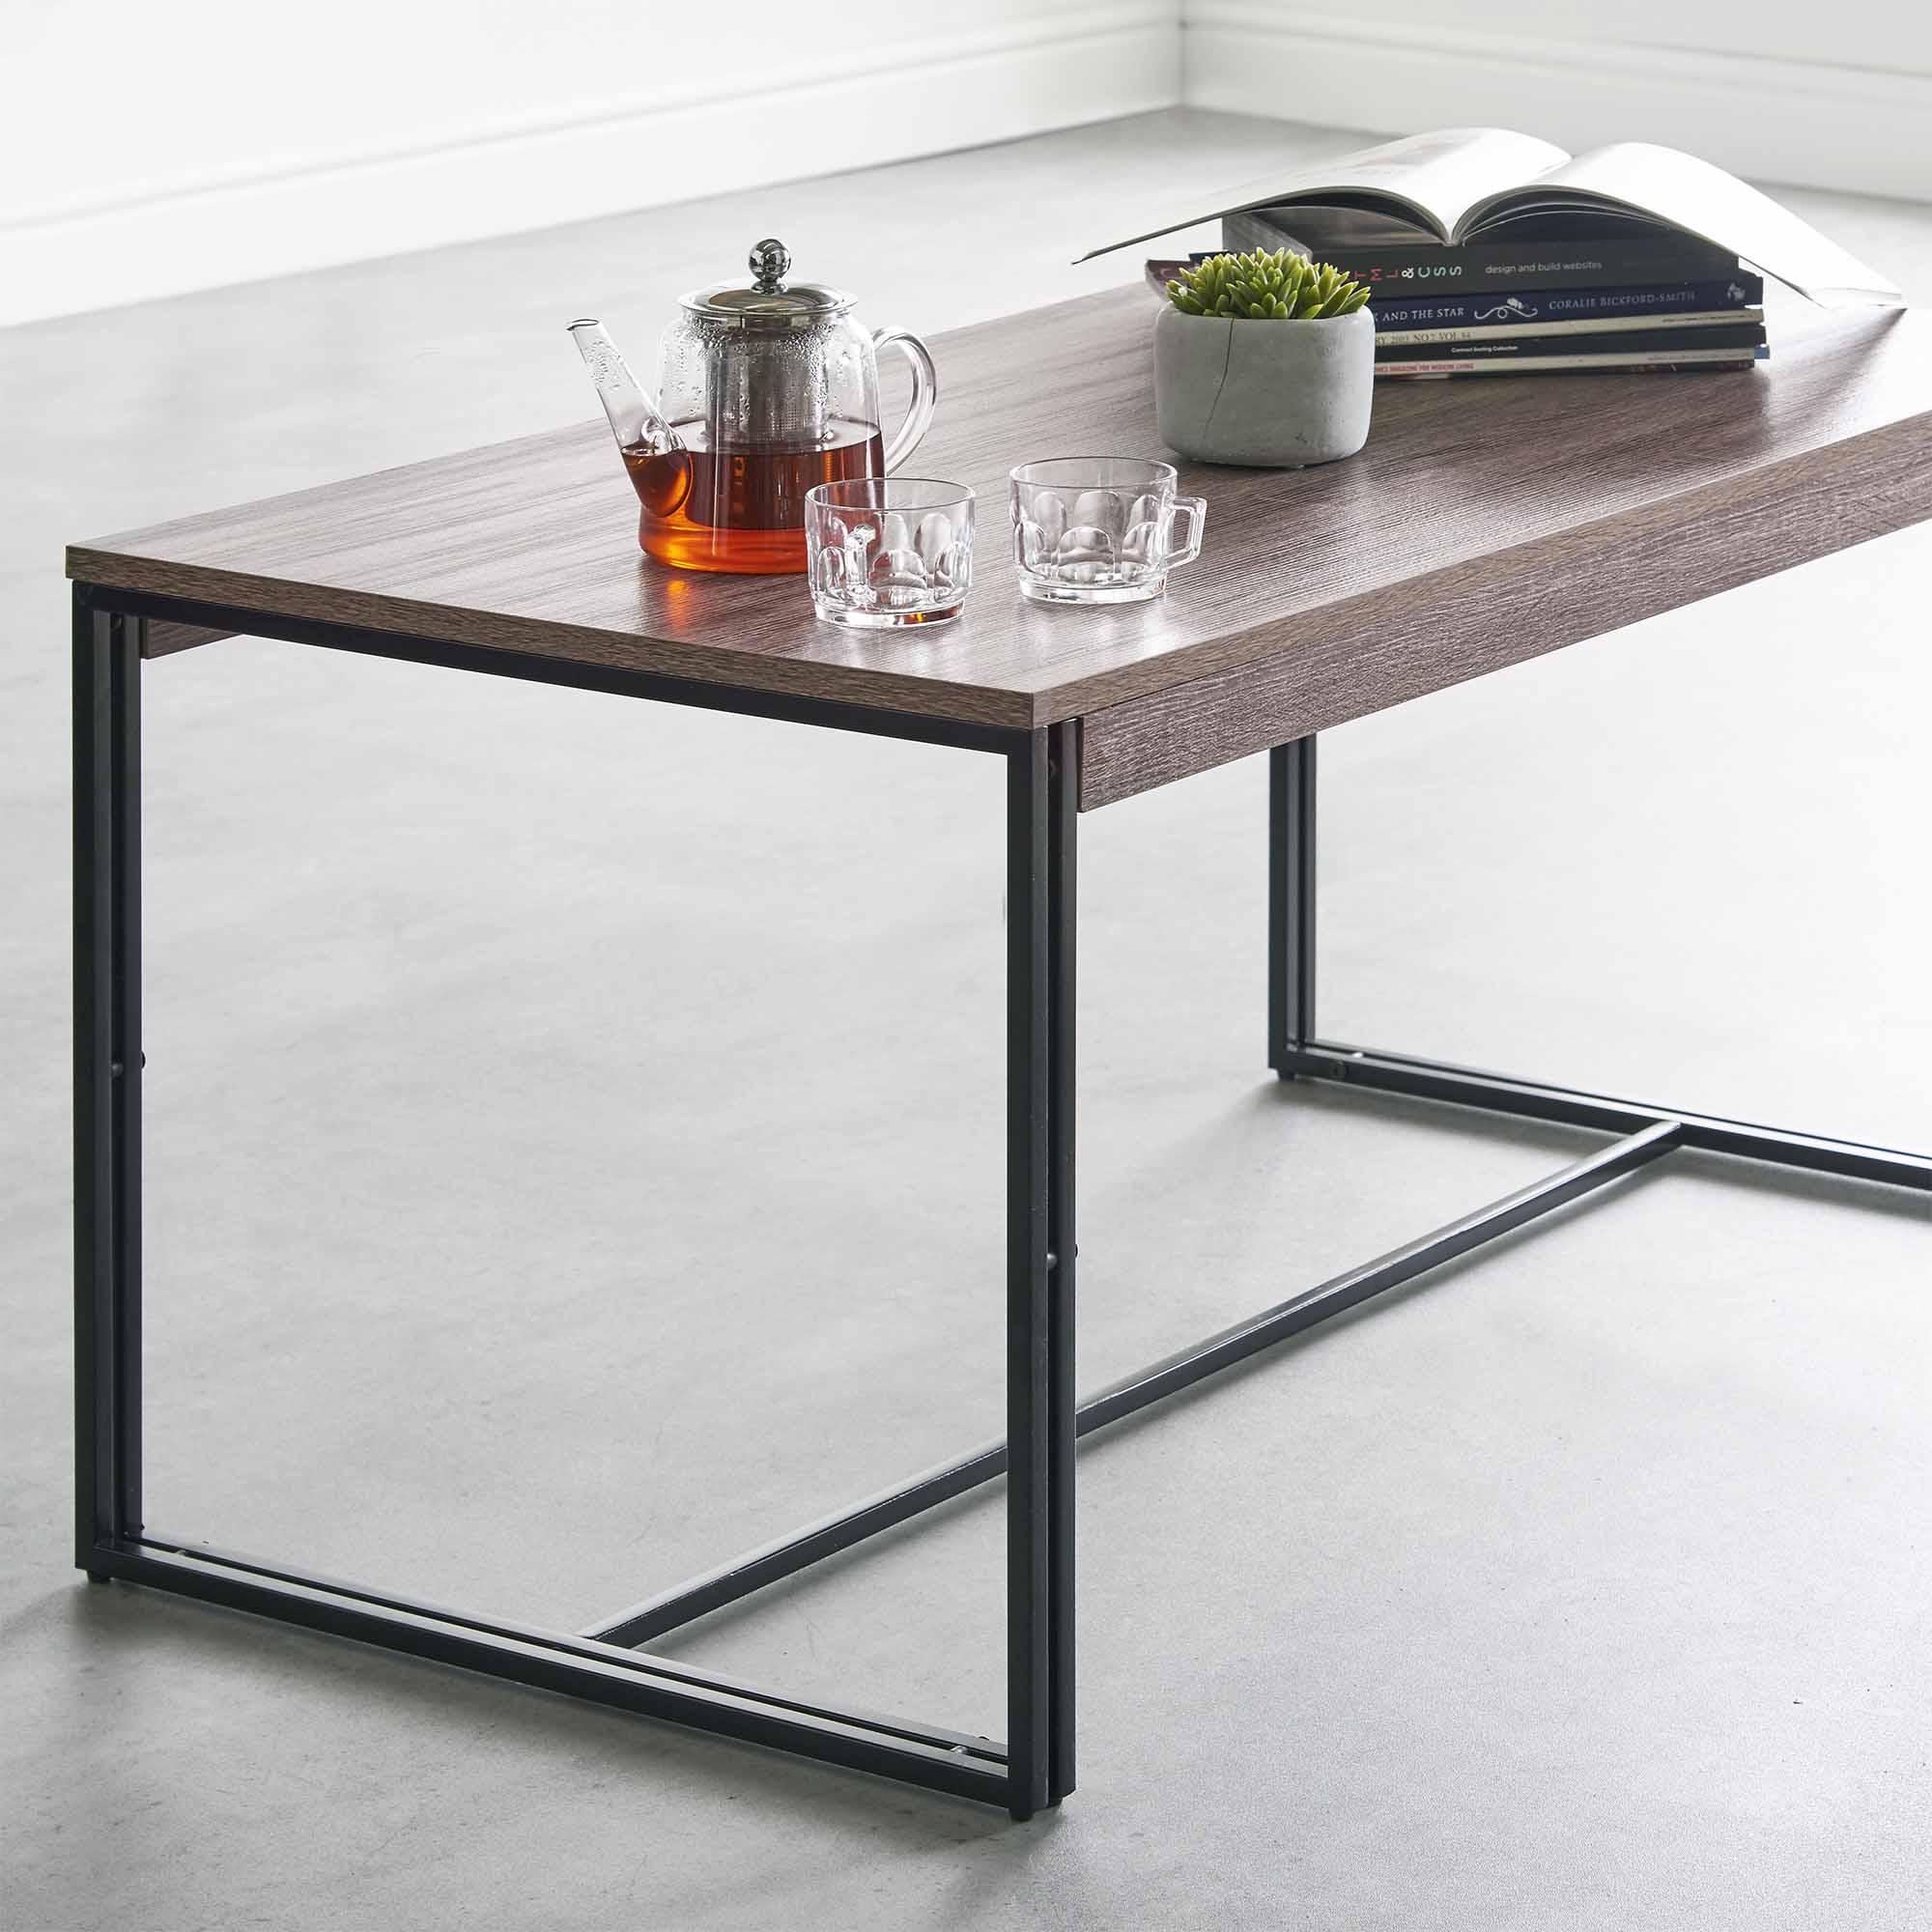 Stylish Designer Coffee Table Industrial Antiques Steam: VonHaus Rustic Coffee Table Modern Industrial Urban Design